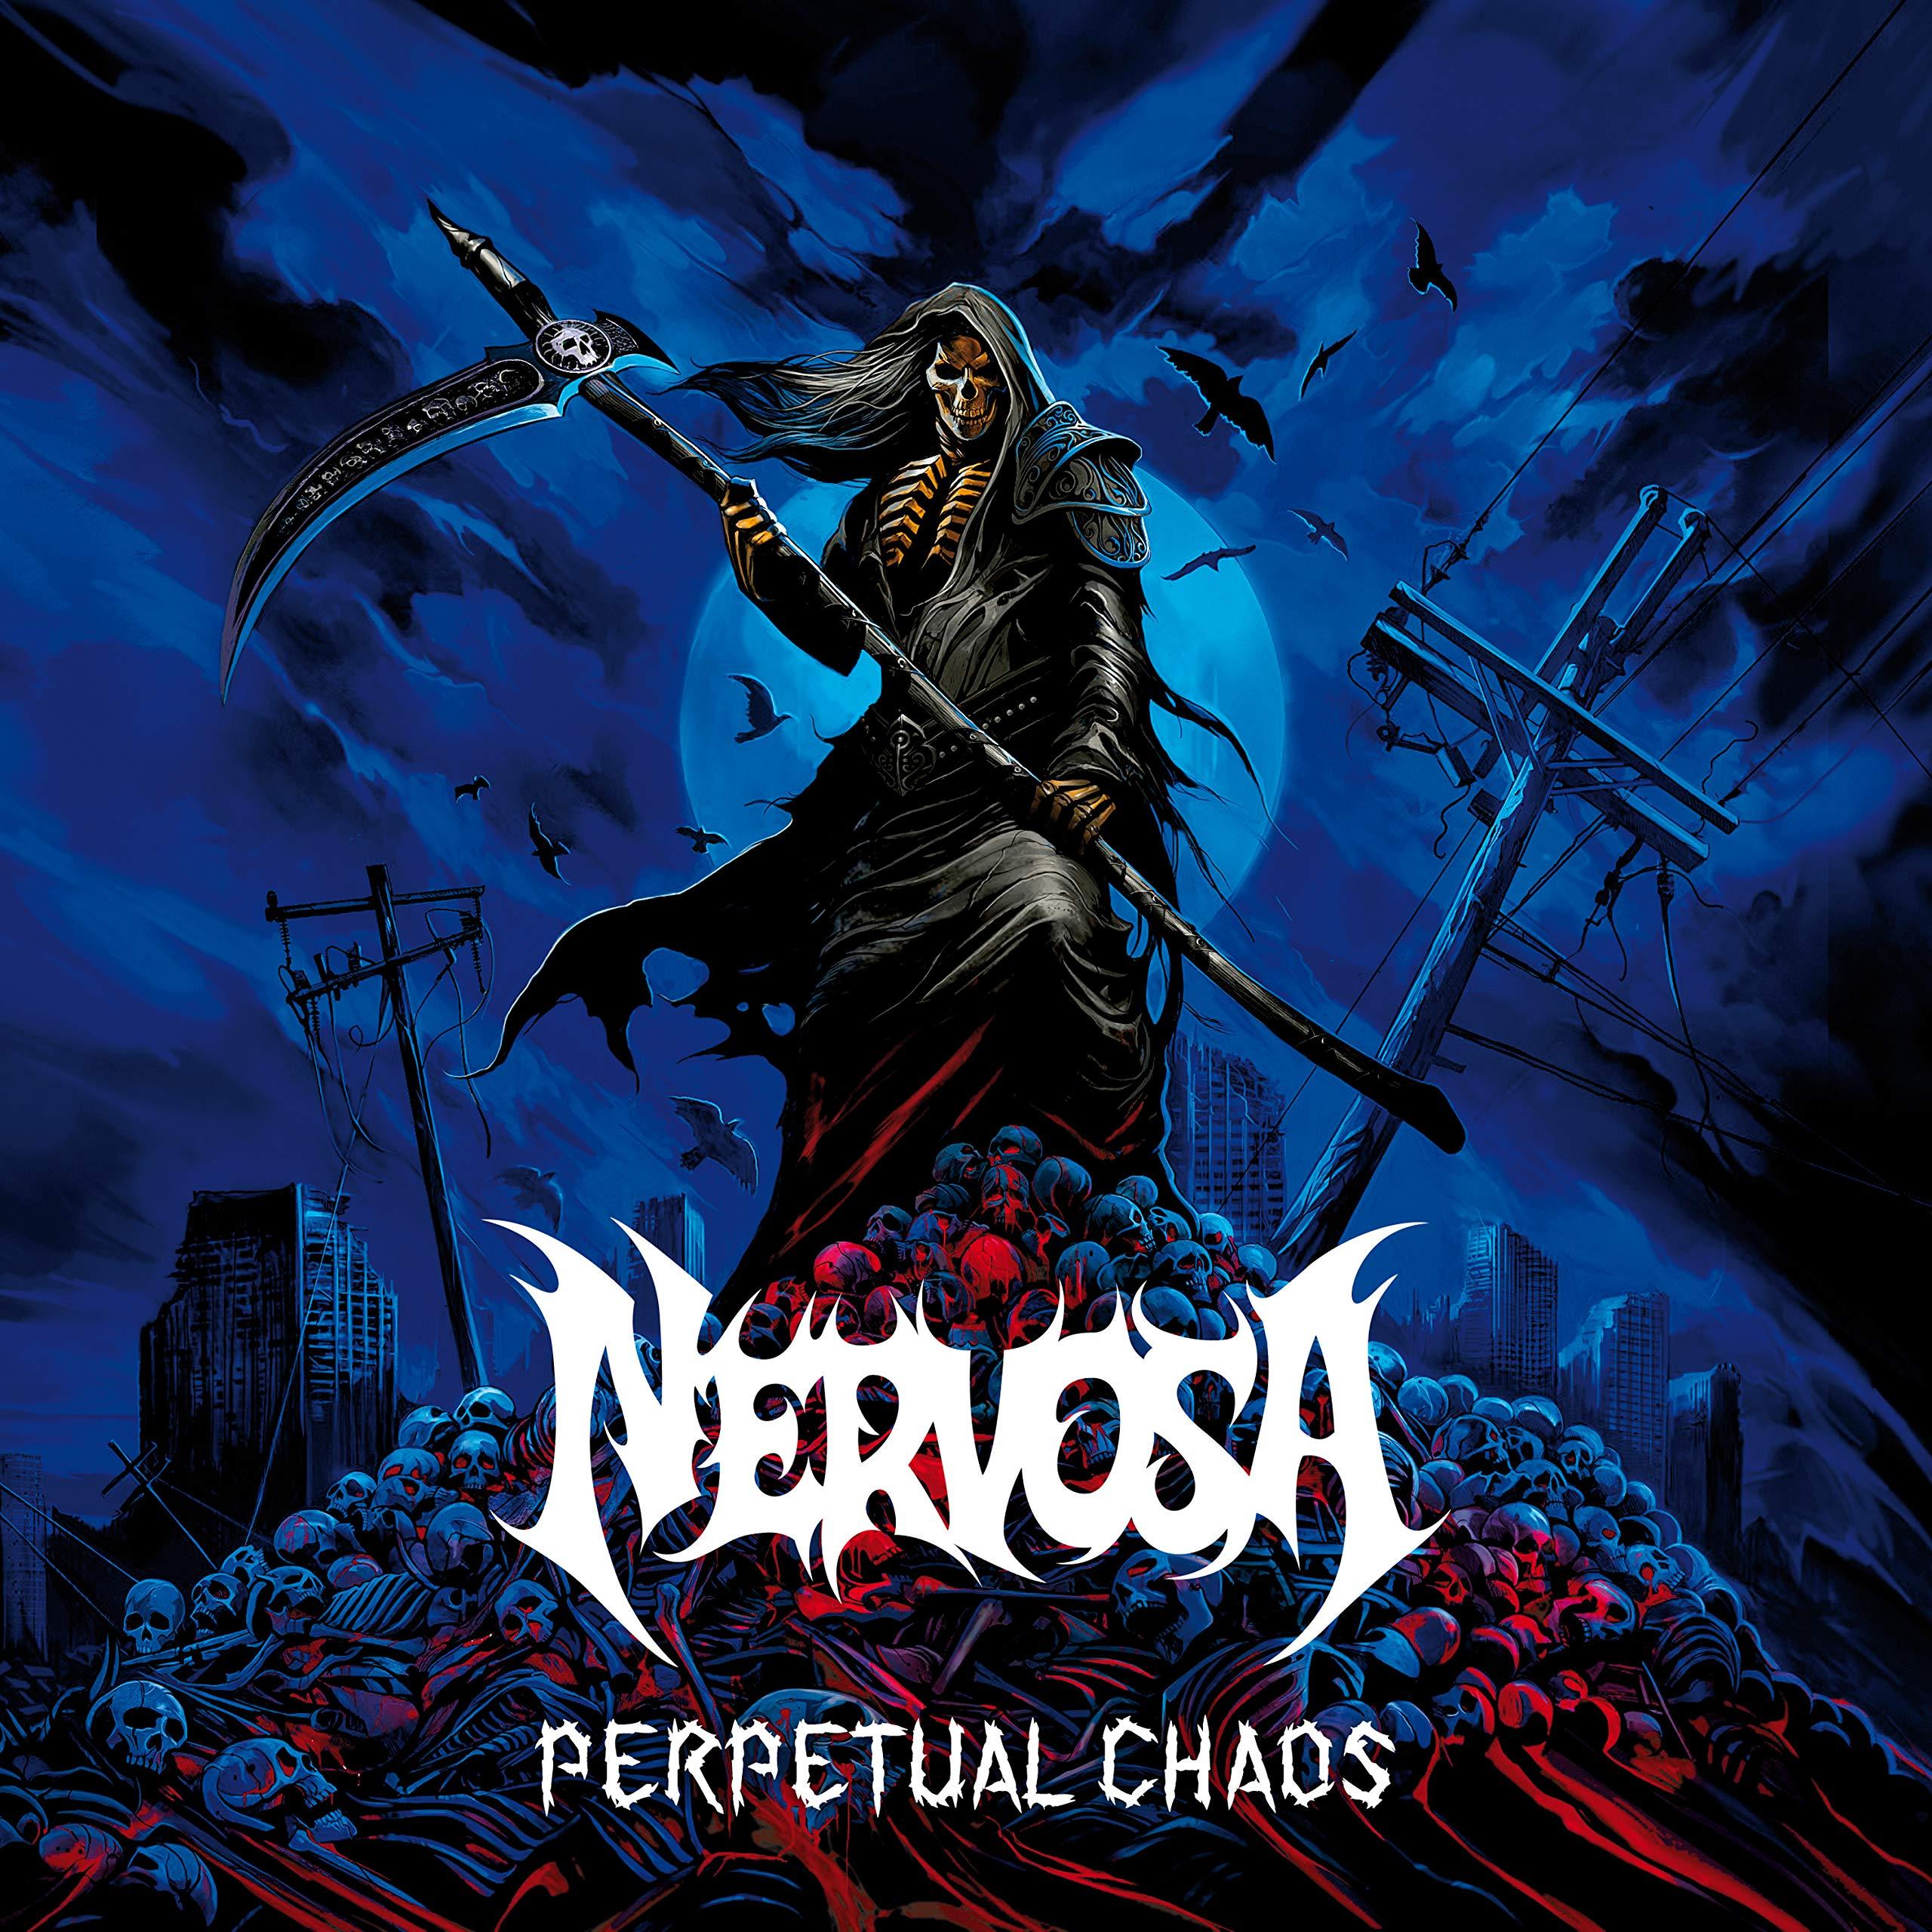 Nervosa - Perpetual Chaos (2021) [FLAC] Download